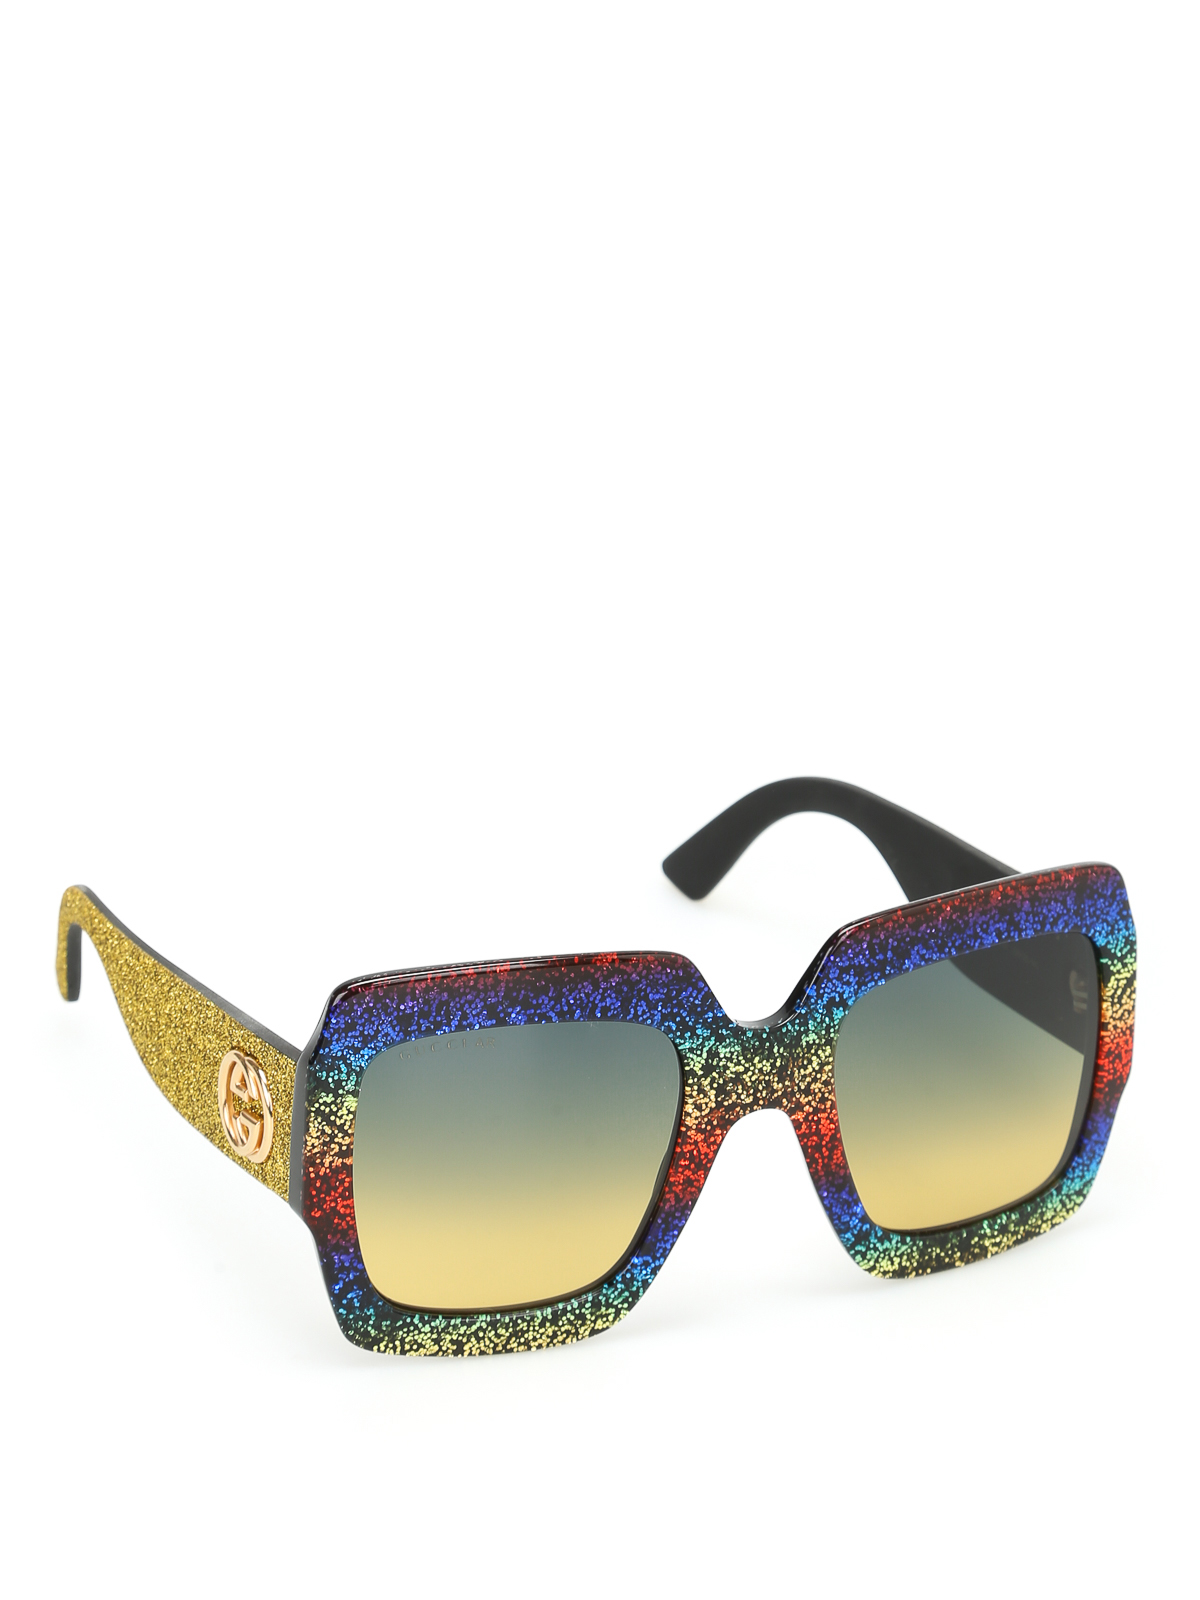 7158addea Gucci - Rainbow over sunglasses - sunglasses - GG0102S5 | iKRIX.com